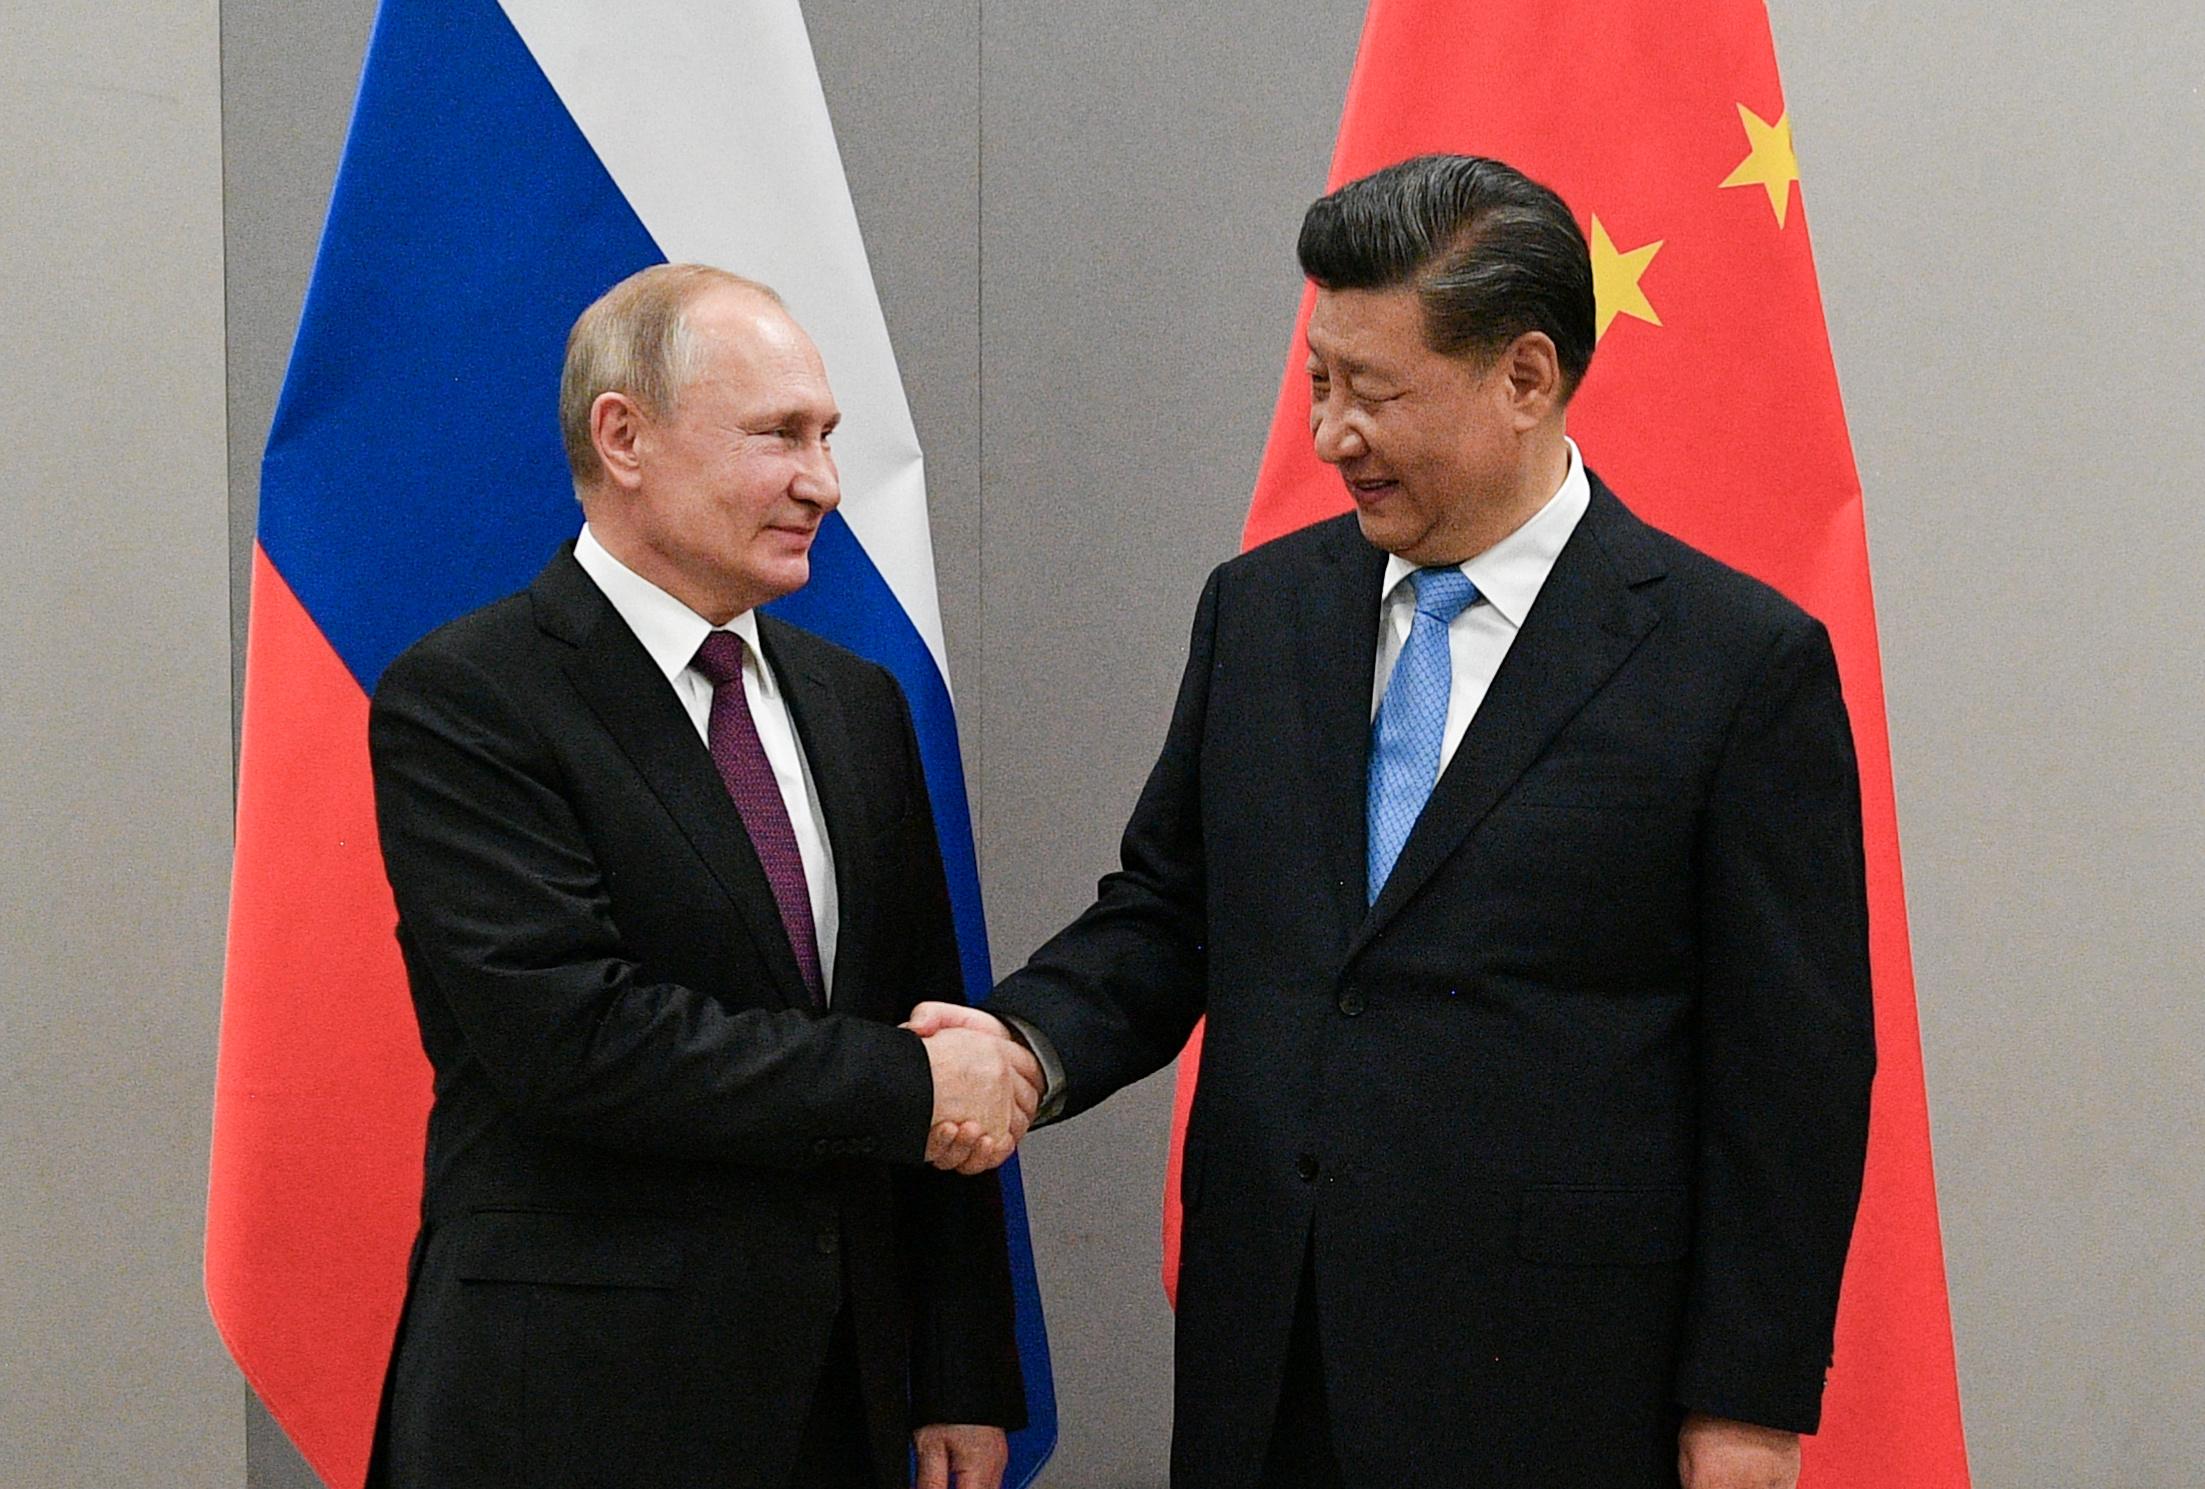 Russian President Vladimir Putin shakes hands with Chinese President Xi Jinping during their meeting on the sidelines of a BRICS summit, in Brasilia, Brazil, November 13, 2019.  Sputnik/Ramil Sitdikov/Kremlin via REUTERS